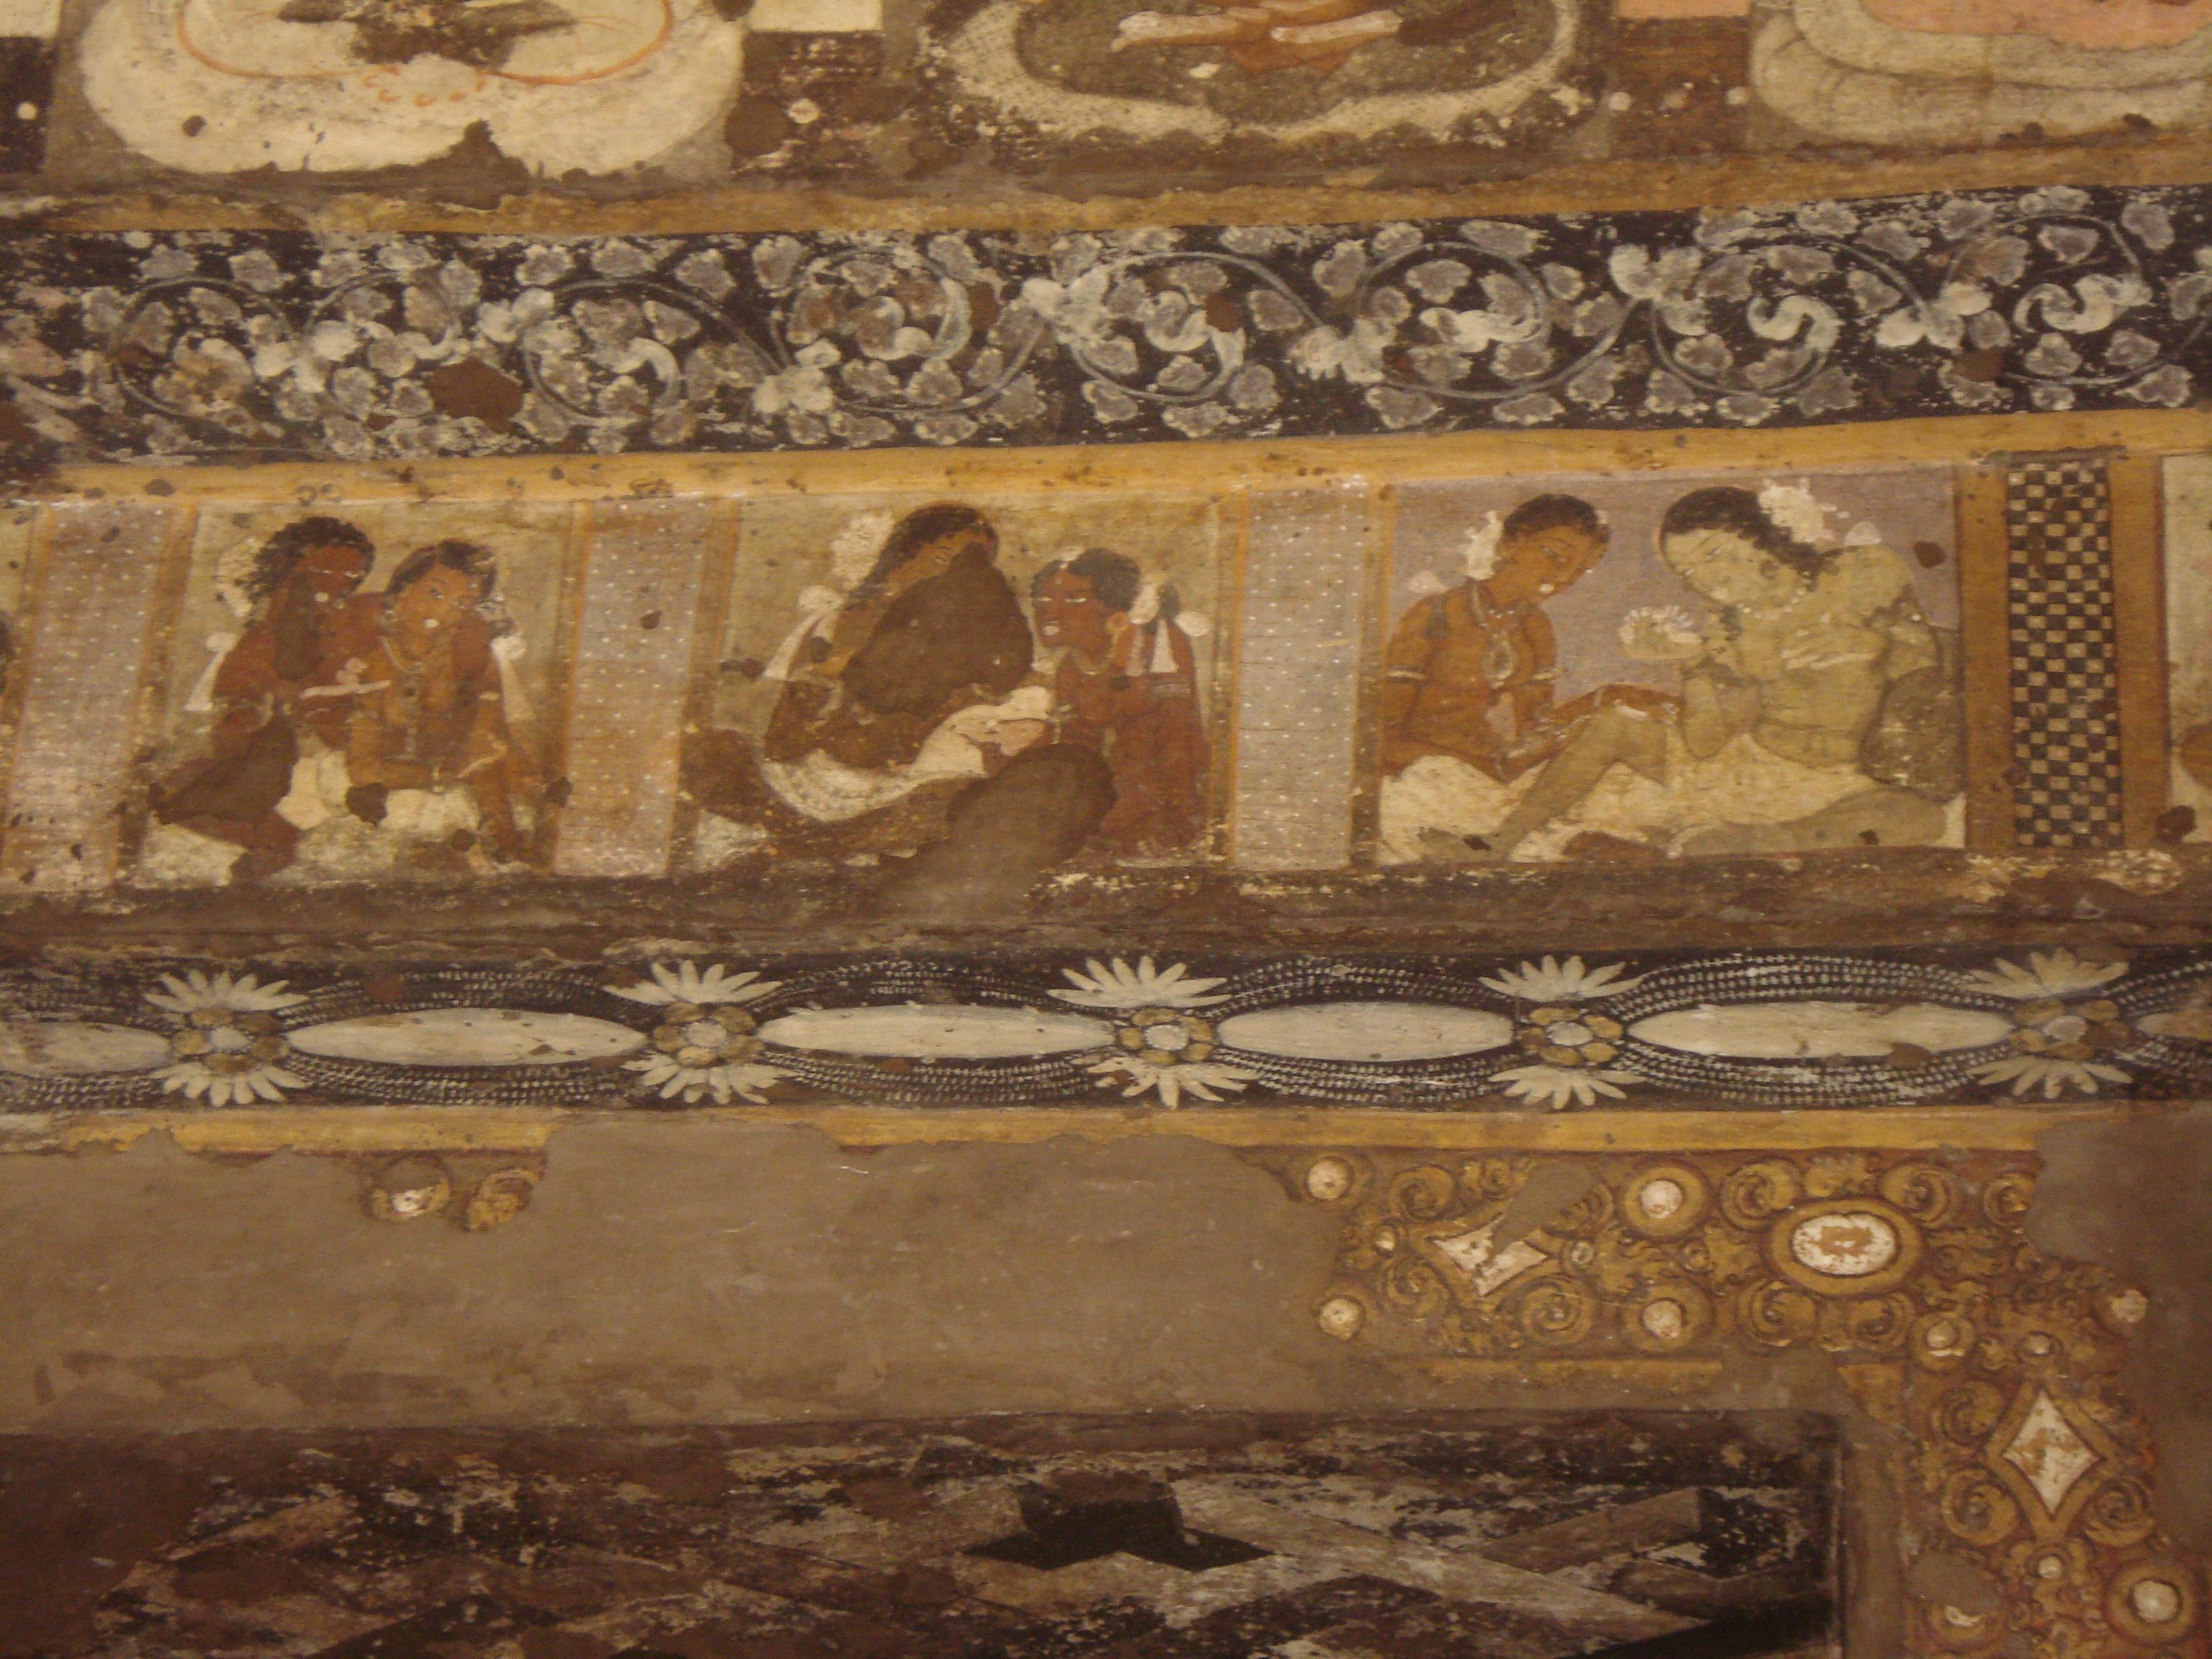 Ajanta Caves Paintings Images